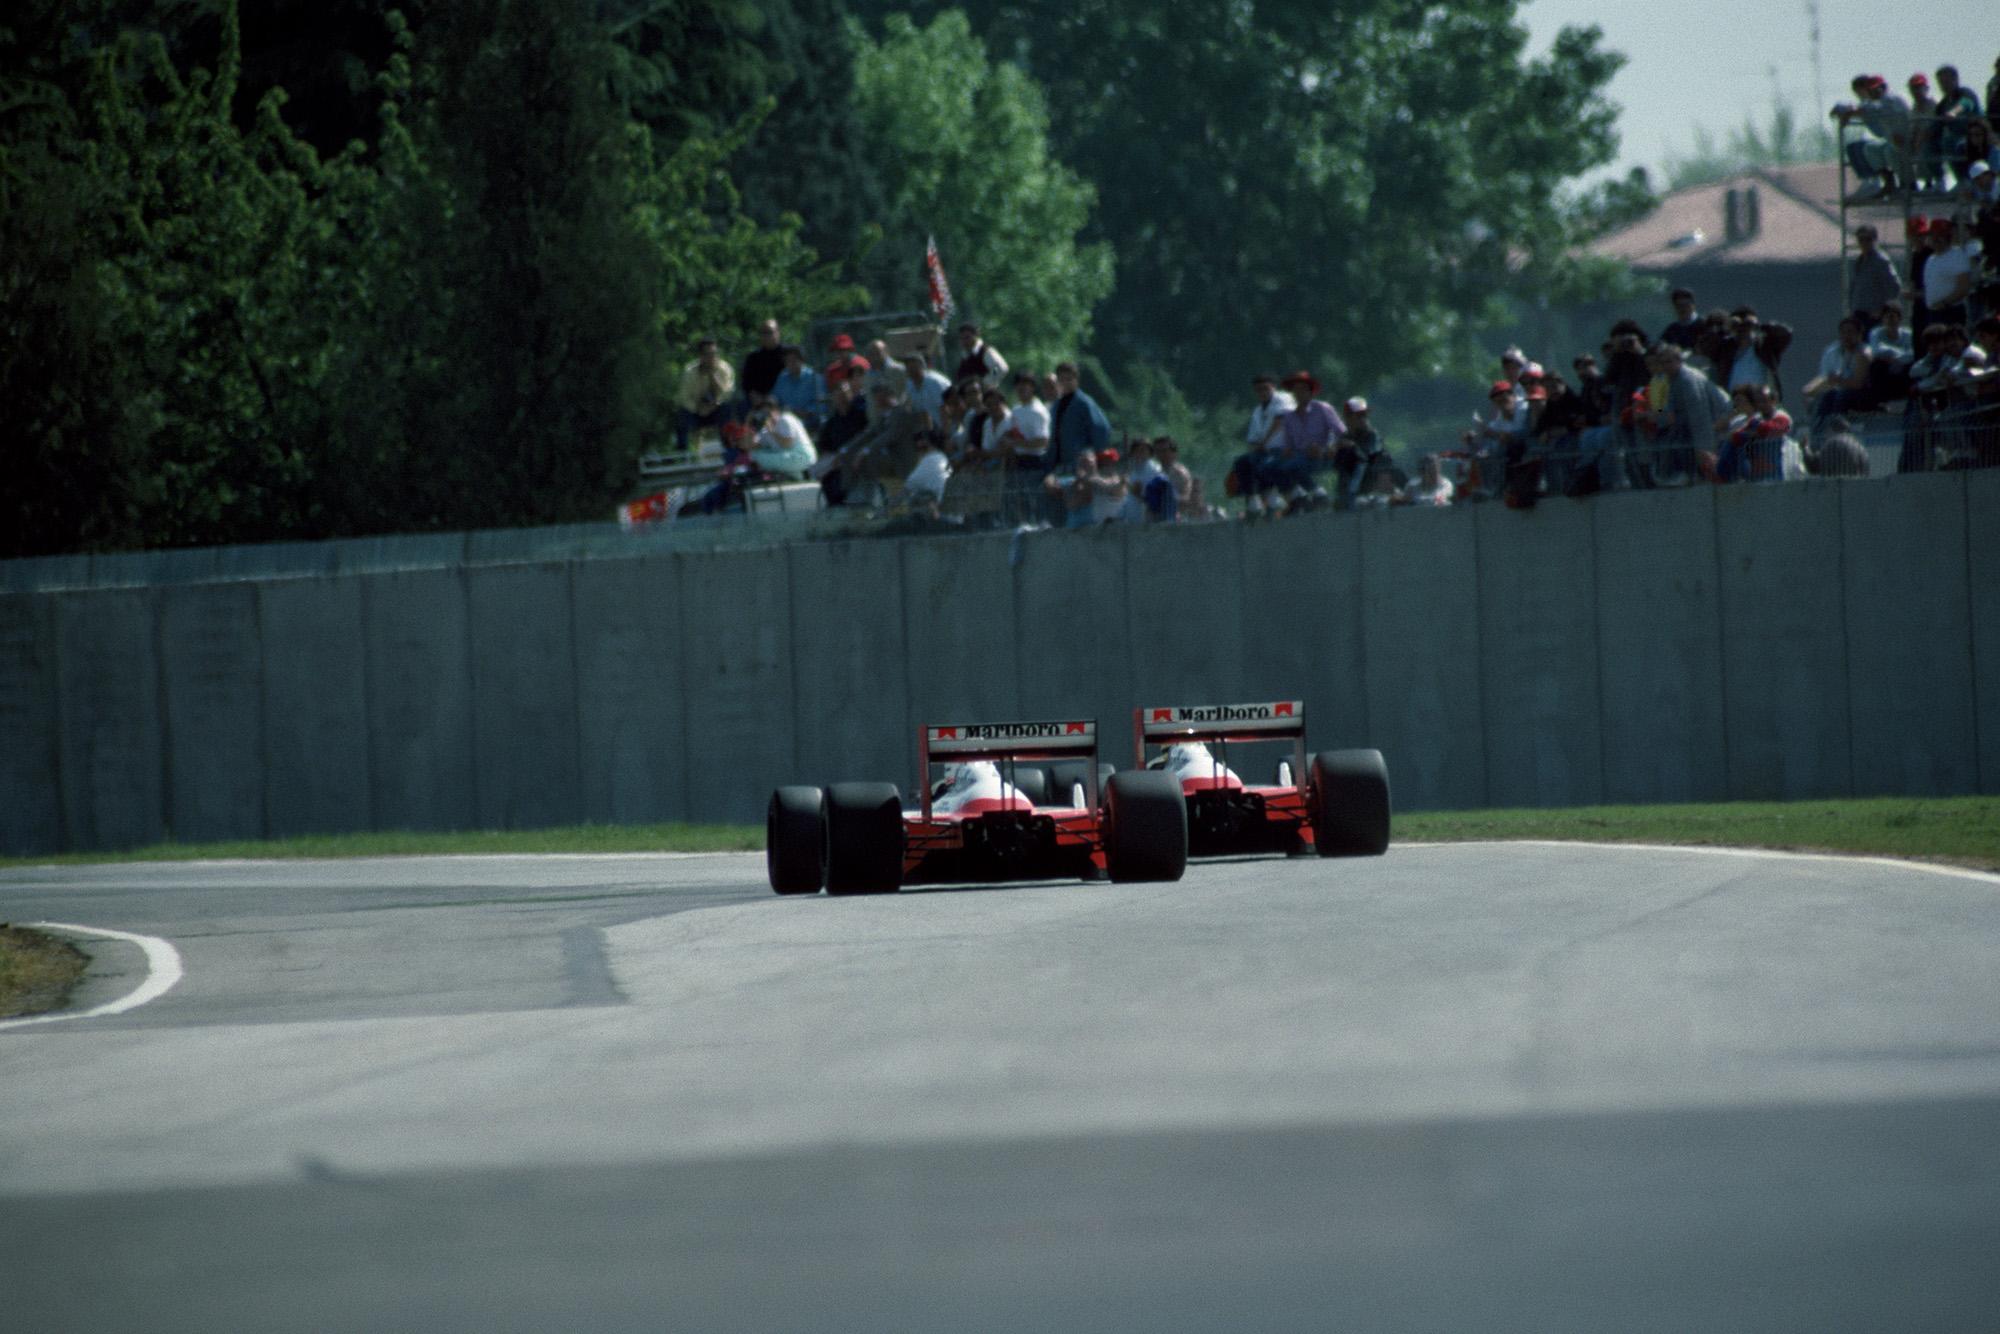 Rear shot of Ayrton Senna and Alain Prost's McLarens at Imola